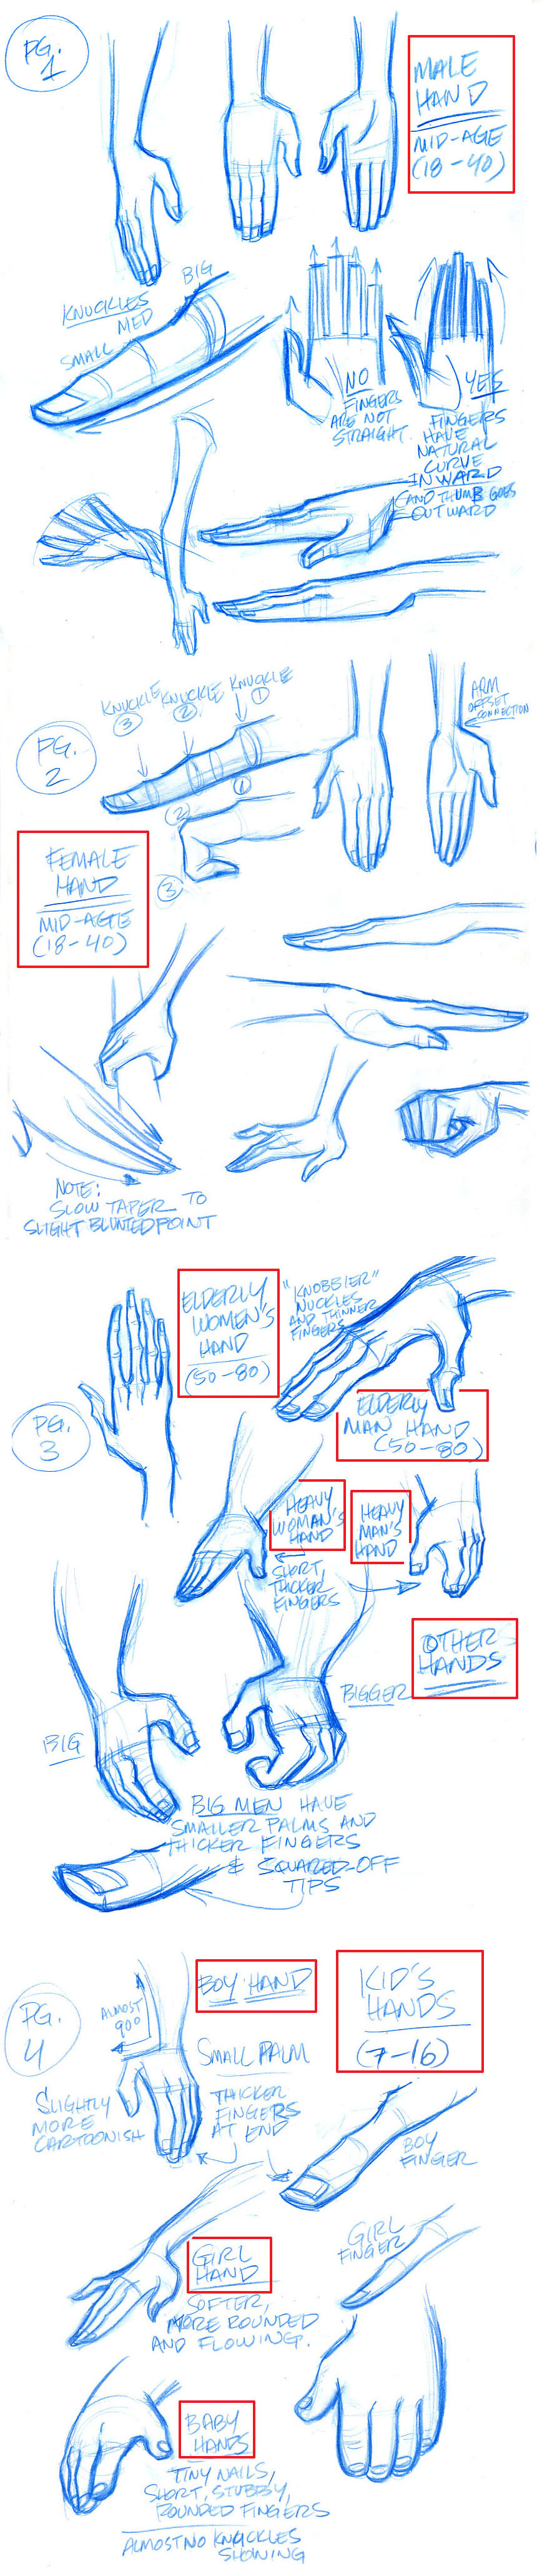 stylized_HANDS_modelsheetsz_bancroft.jpg